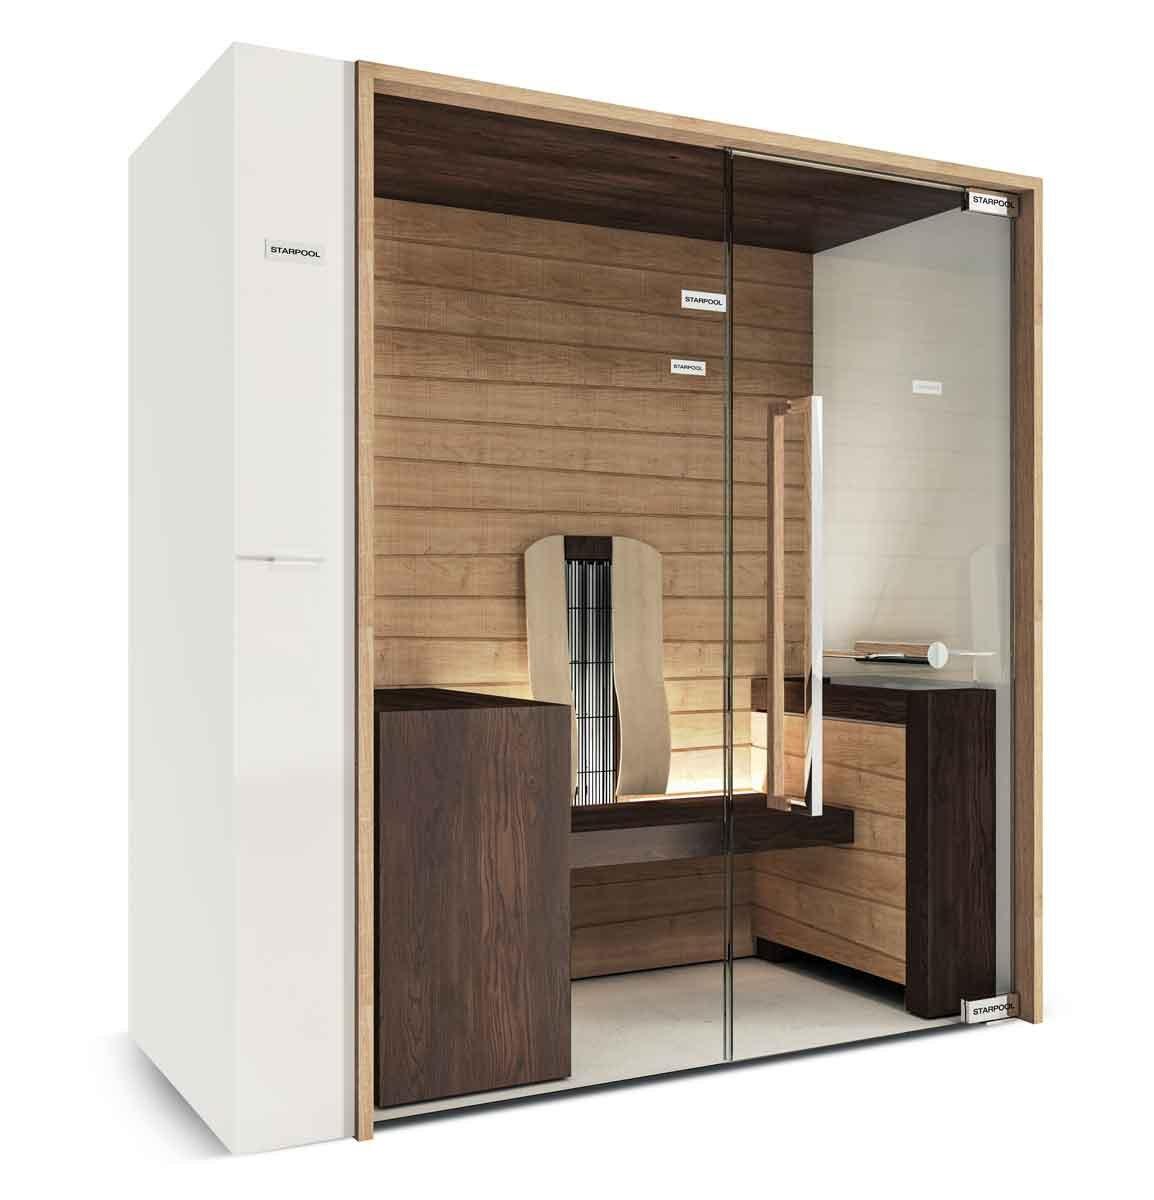 La sauna anche a casa cose di casa for Costruire una sauna in casa